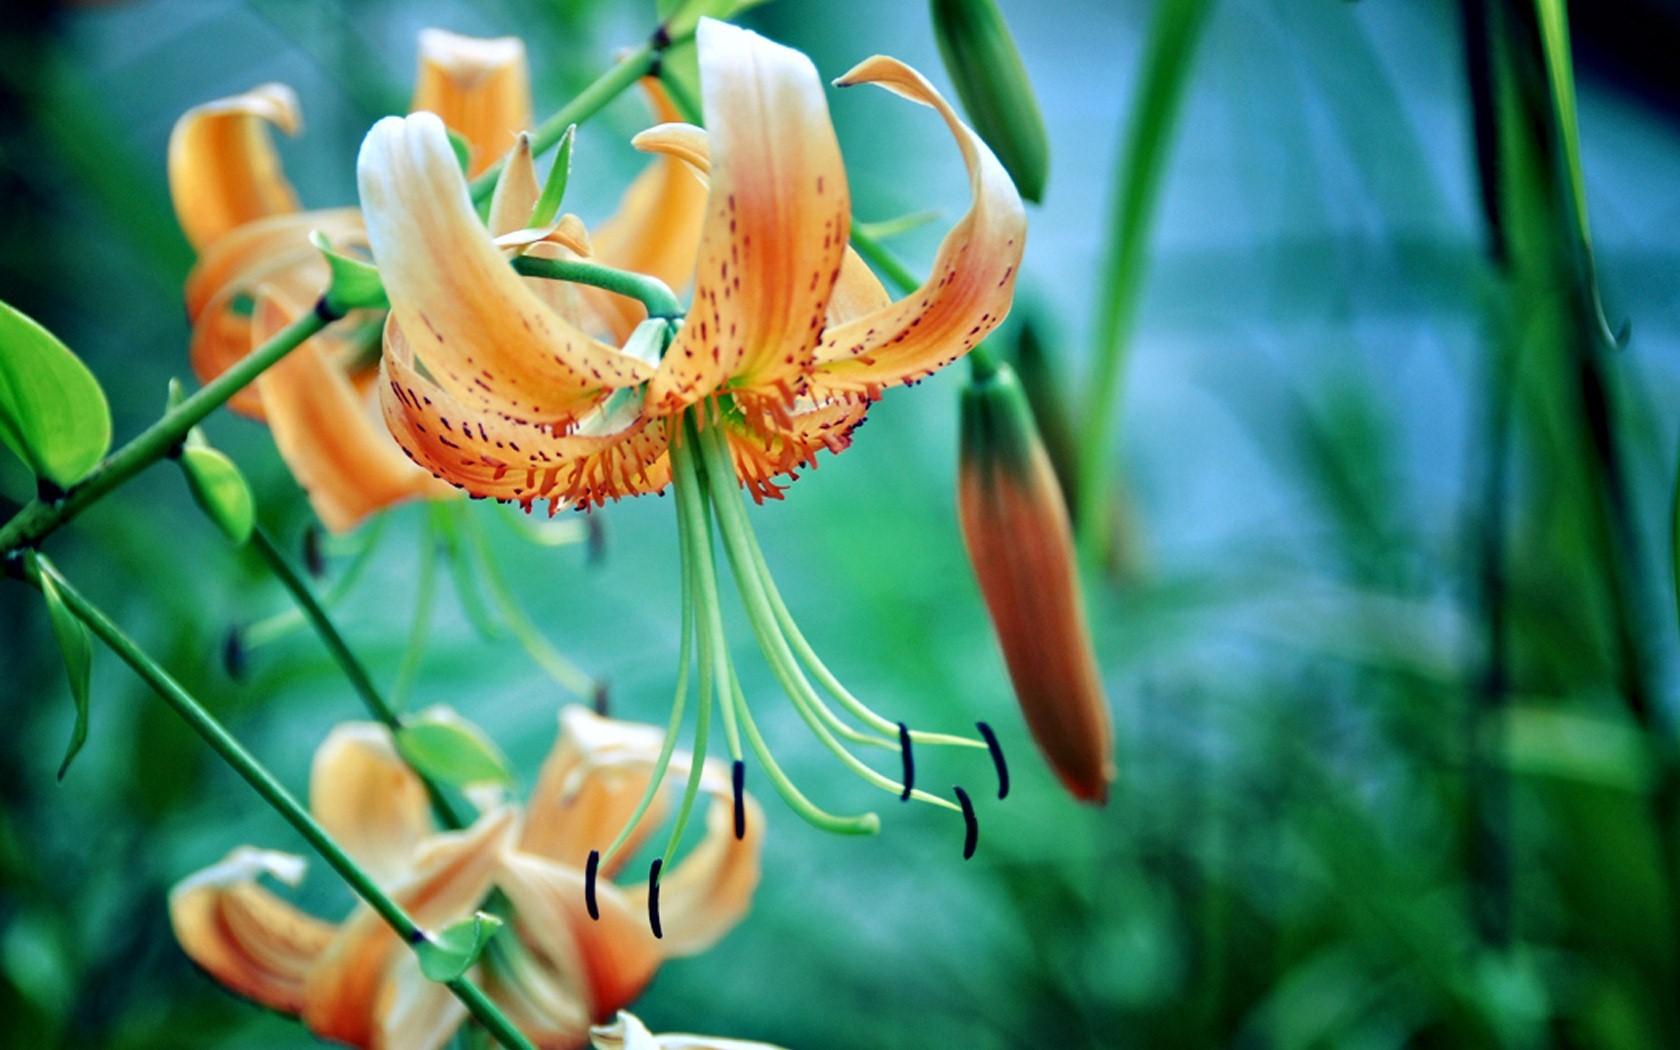 Flowers Hd Wallpapers Hd Wallpapers